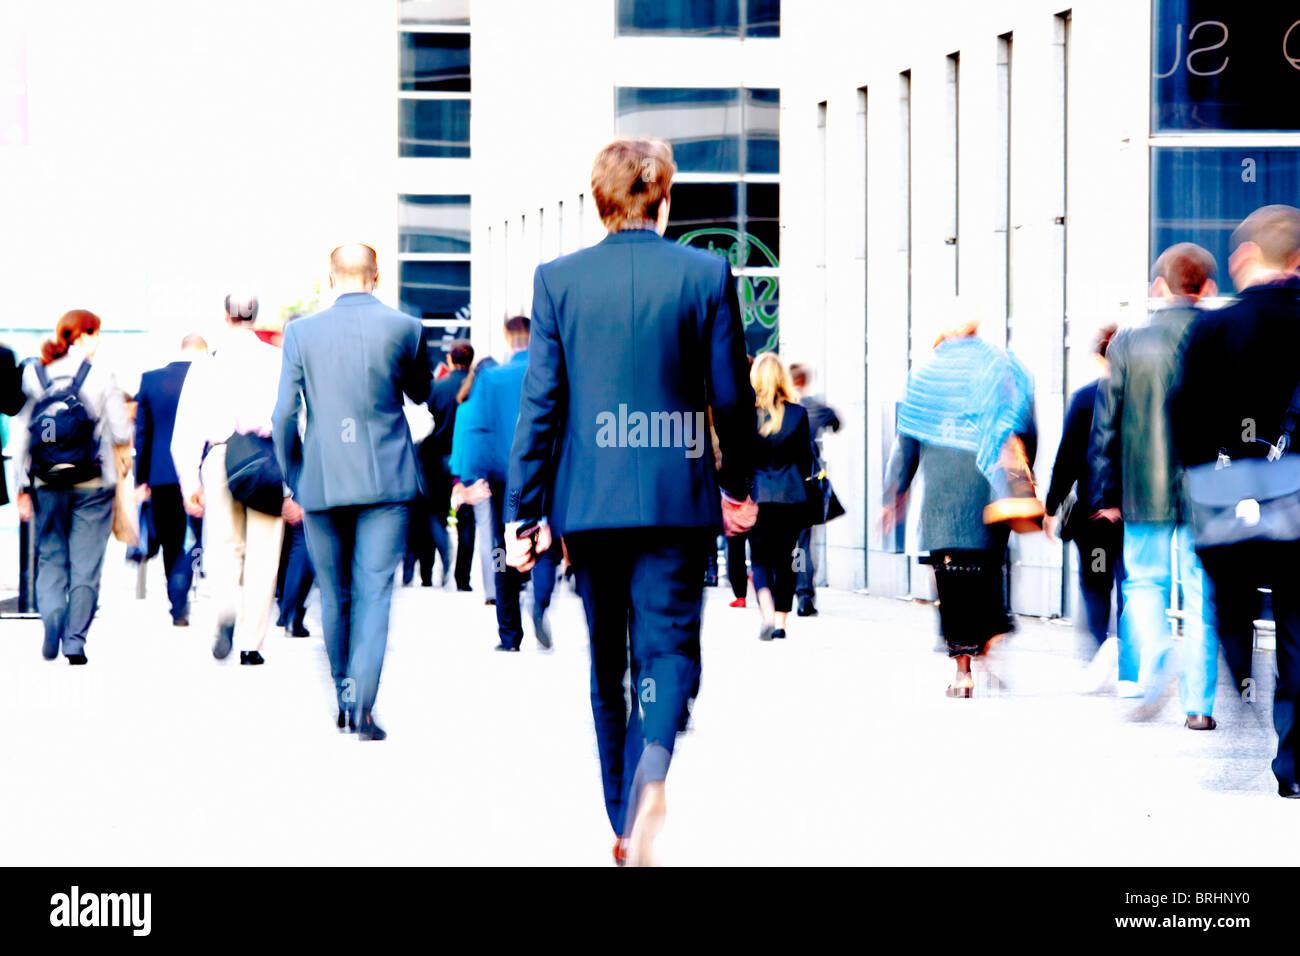 Sidewalk Crowd Stock Photos Amp Sidewalk Crowd Stock Images